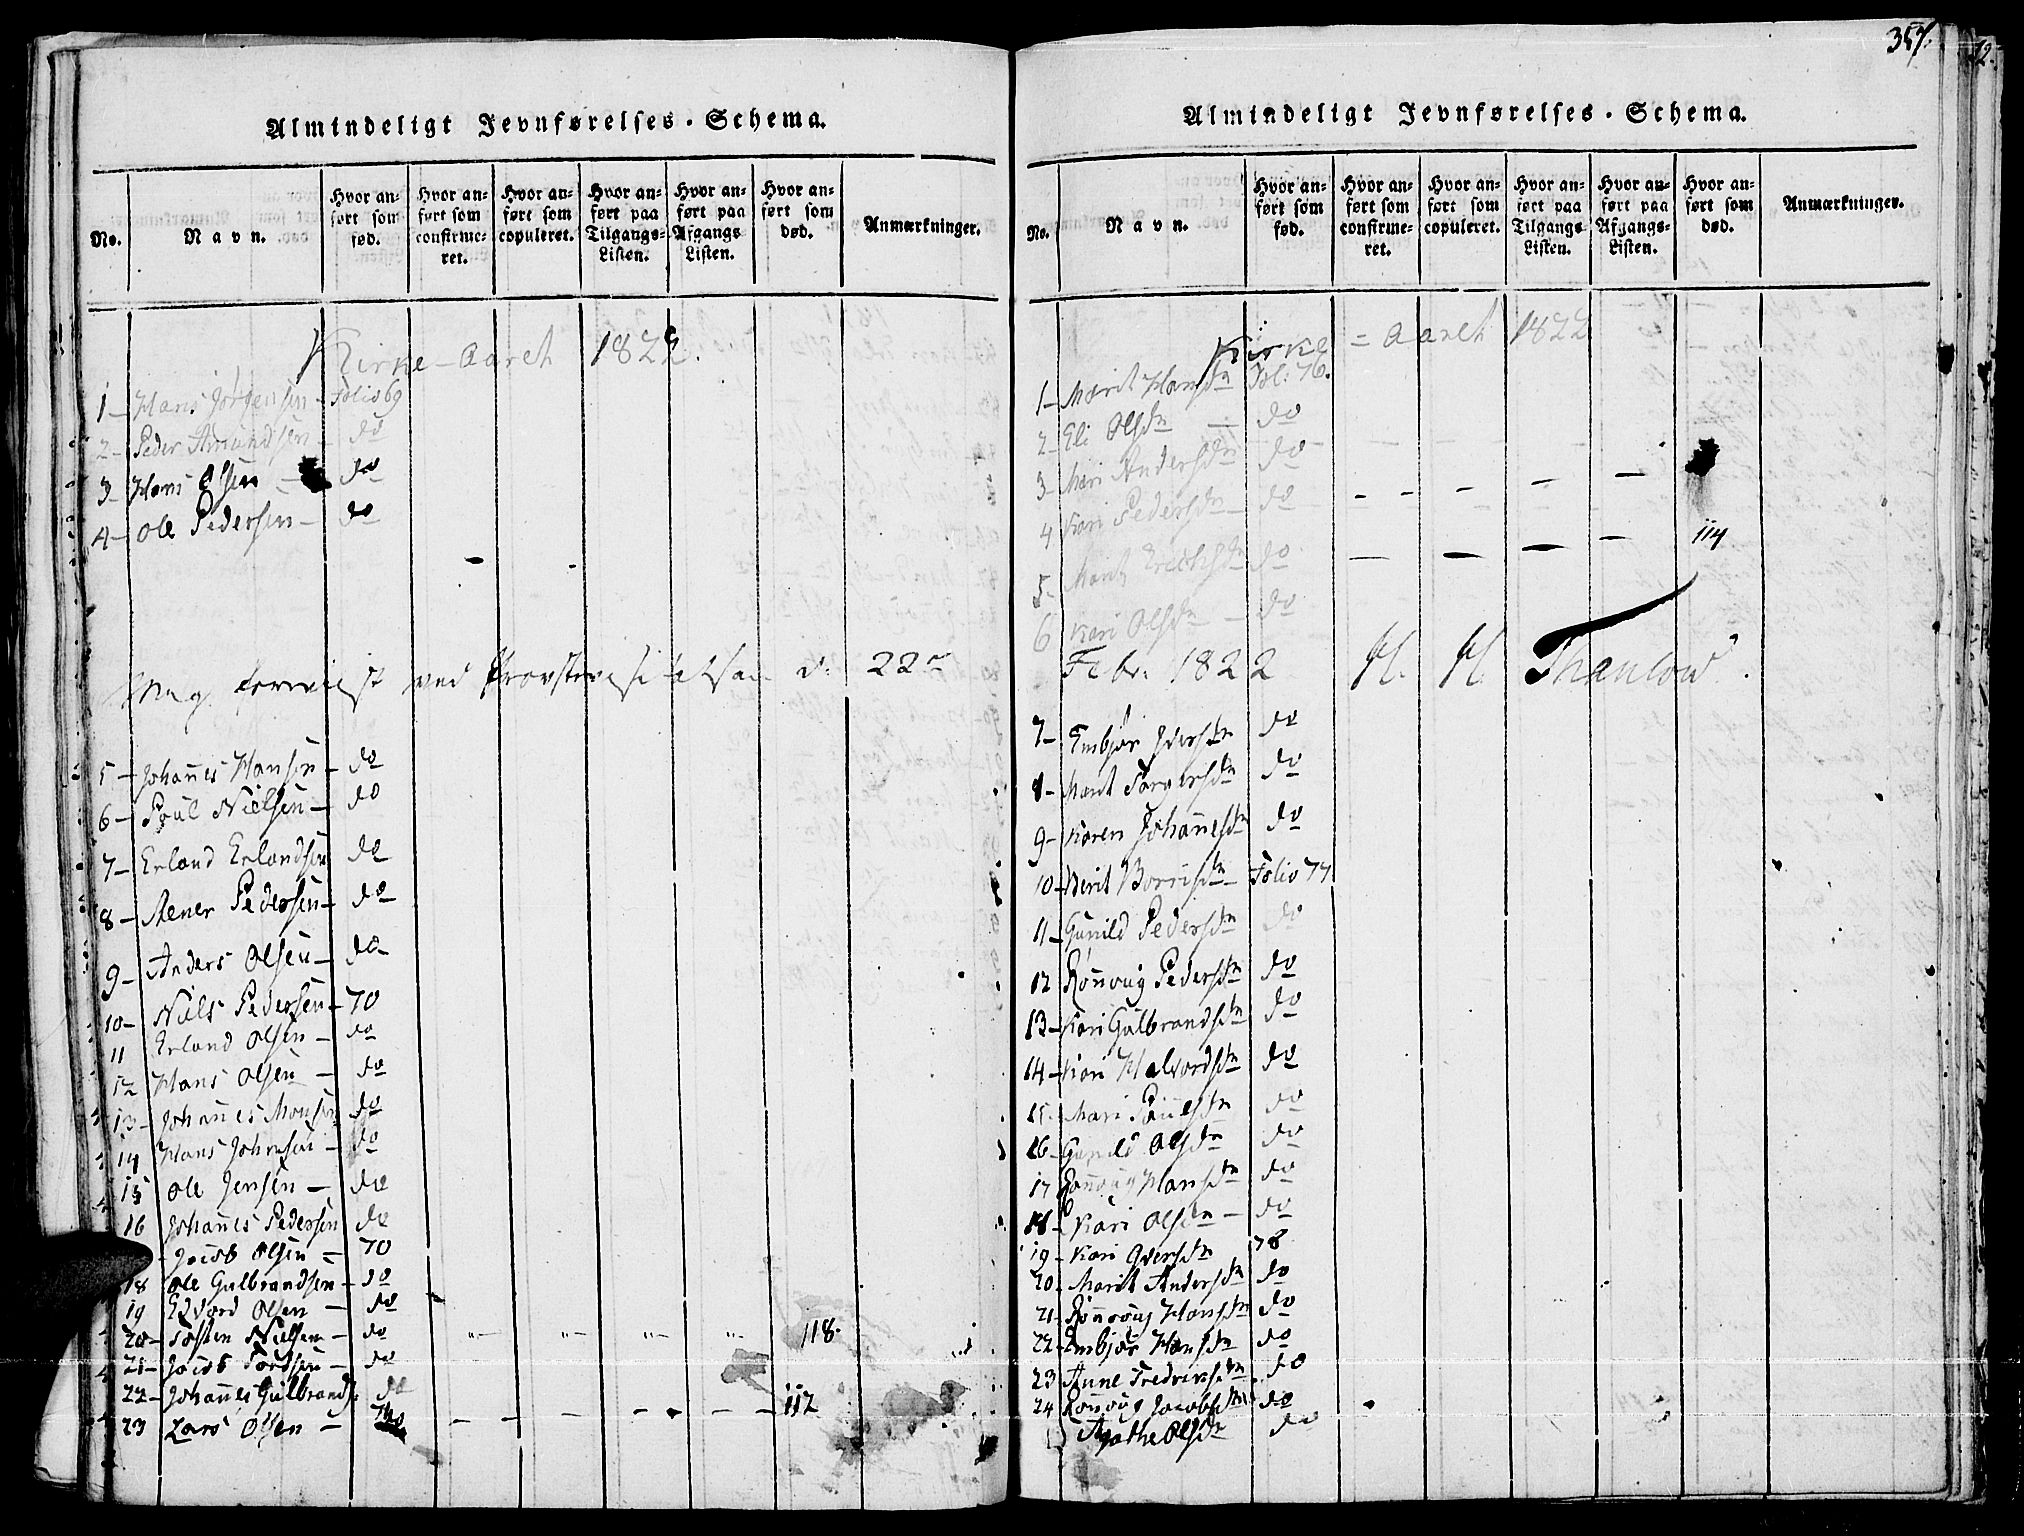 SAH, Fron prestekontor, H/Ha/Haa/L0002: Ministerialbok nr. 2, 1816-1827, s. 357